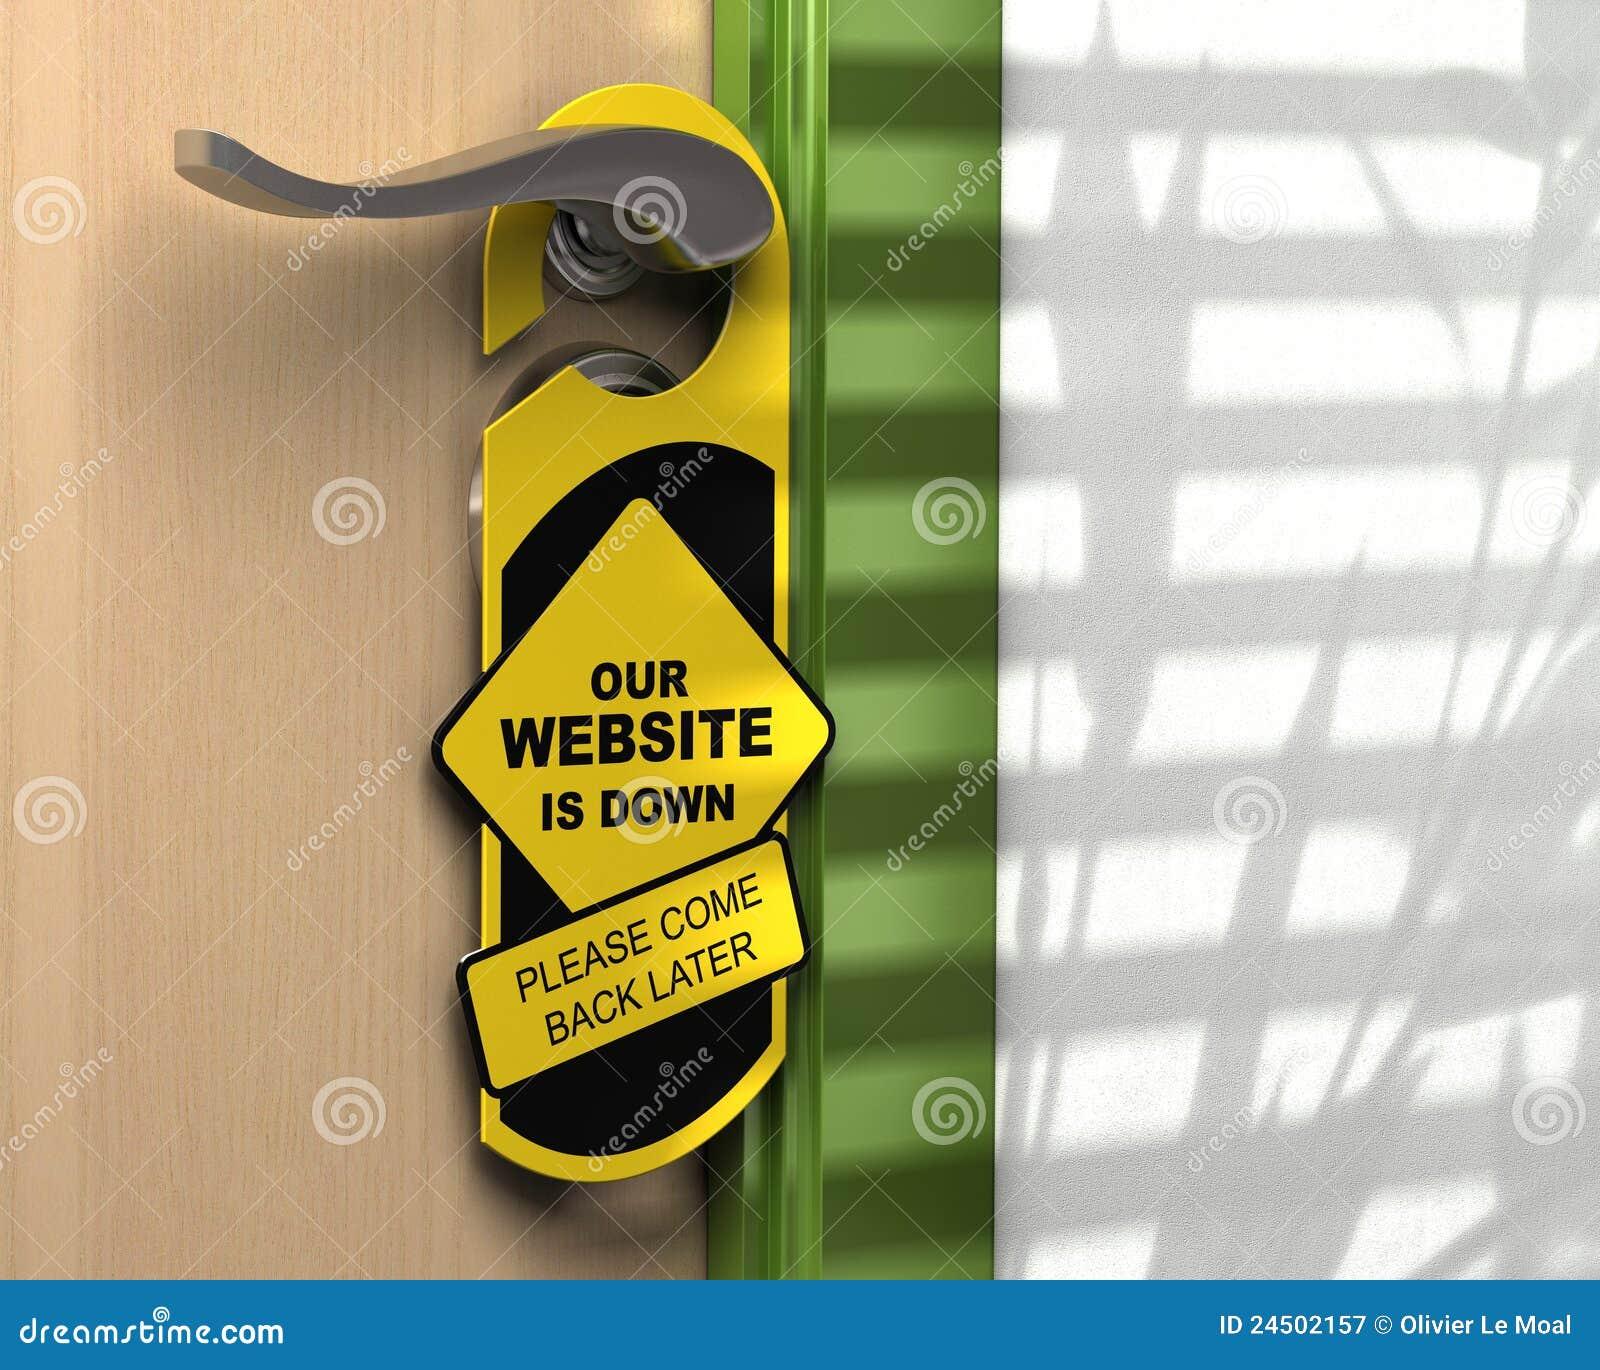 isthiswebsitedown